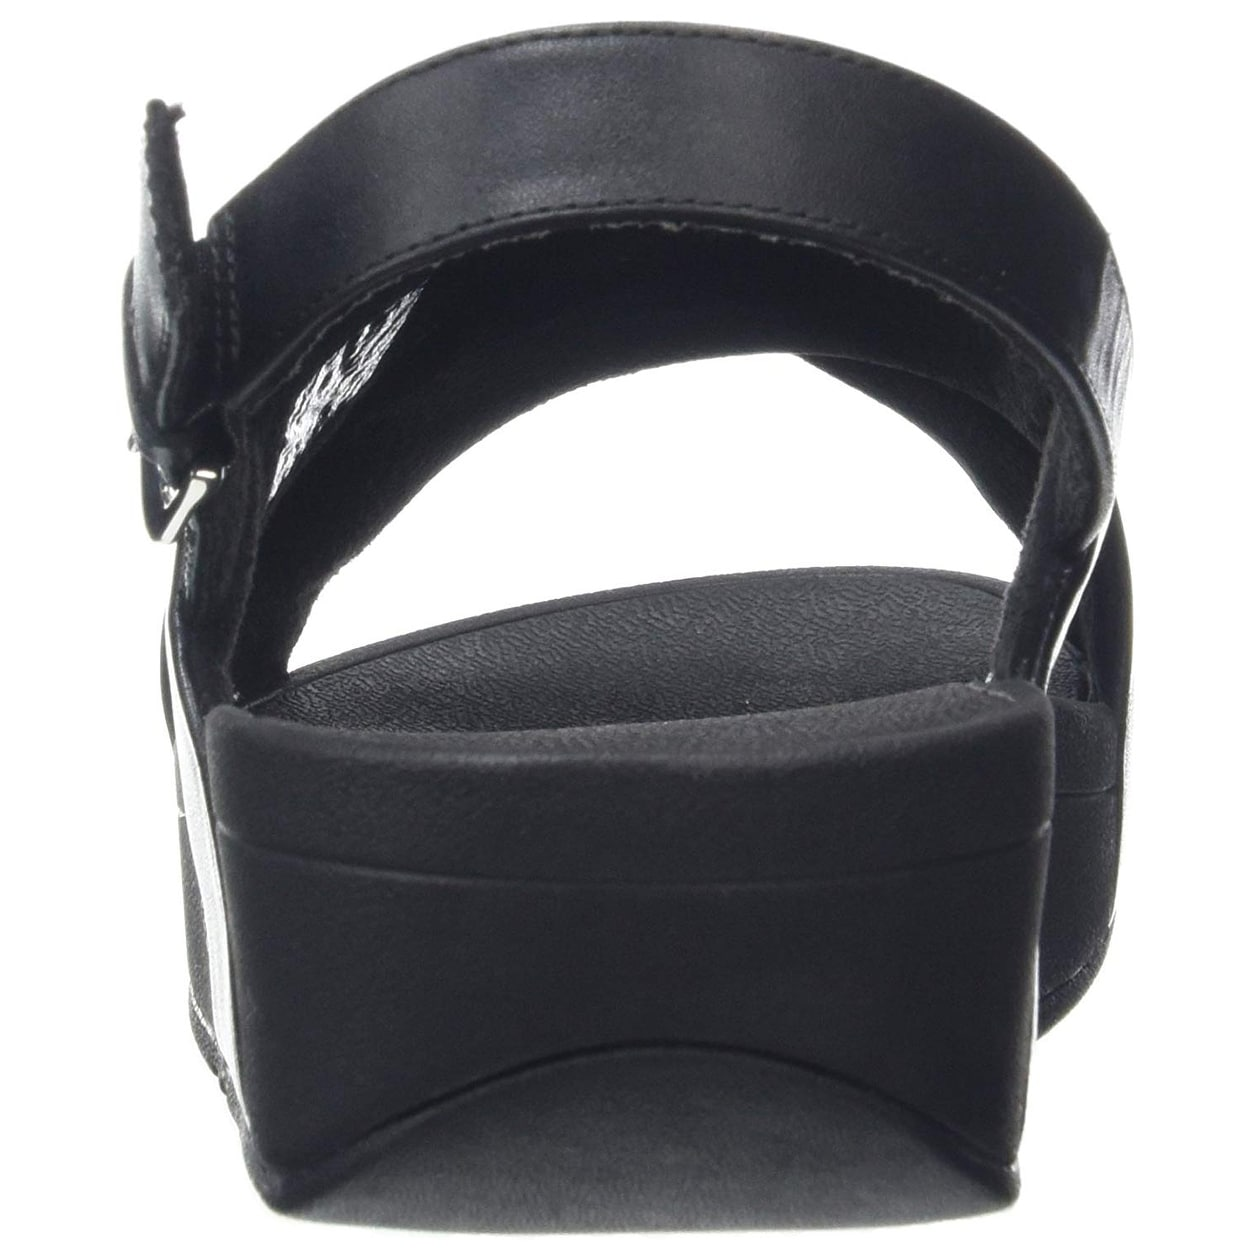 4ae1fdb94 Shop FitFlop K03 Women s Lulu Cross Back-Strap Sandal - 6 - Free Shipping  Today - Overstock.com - 27102134